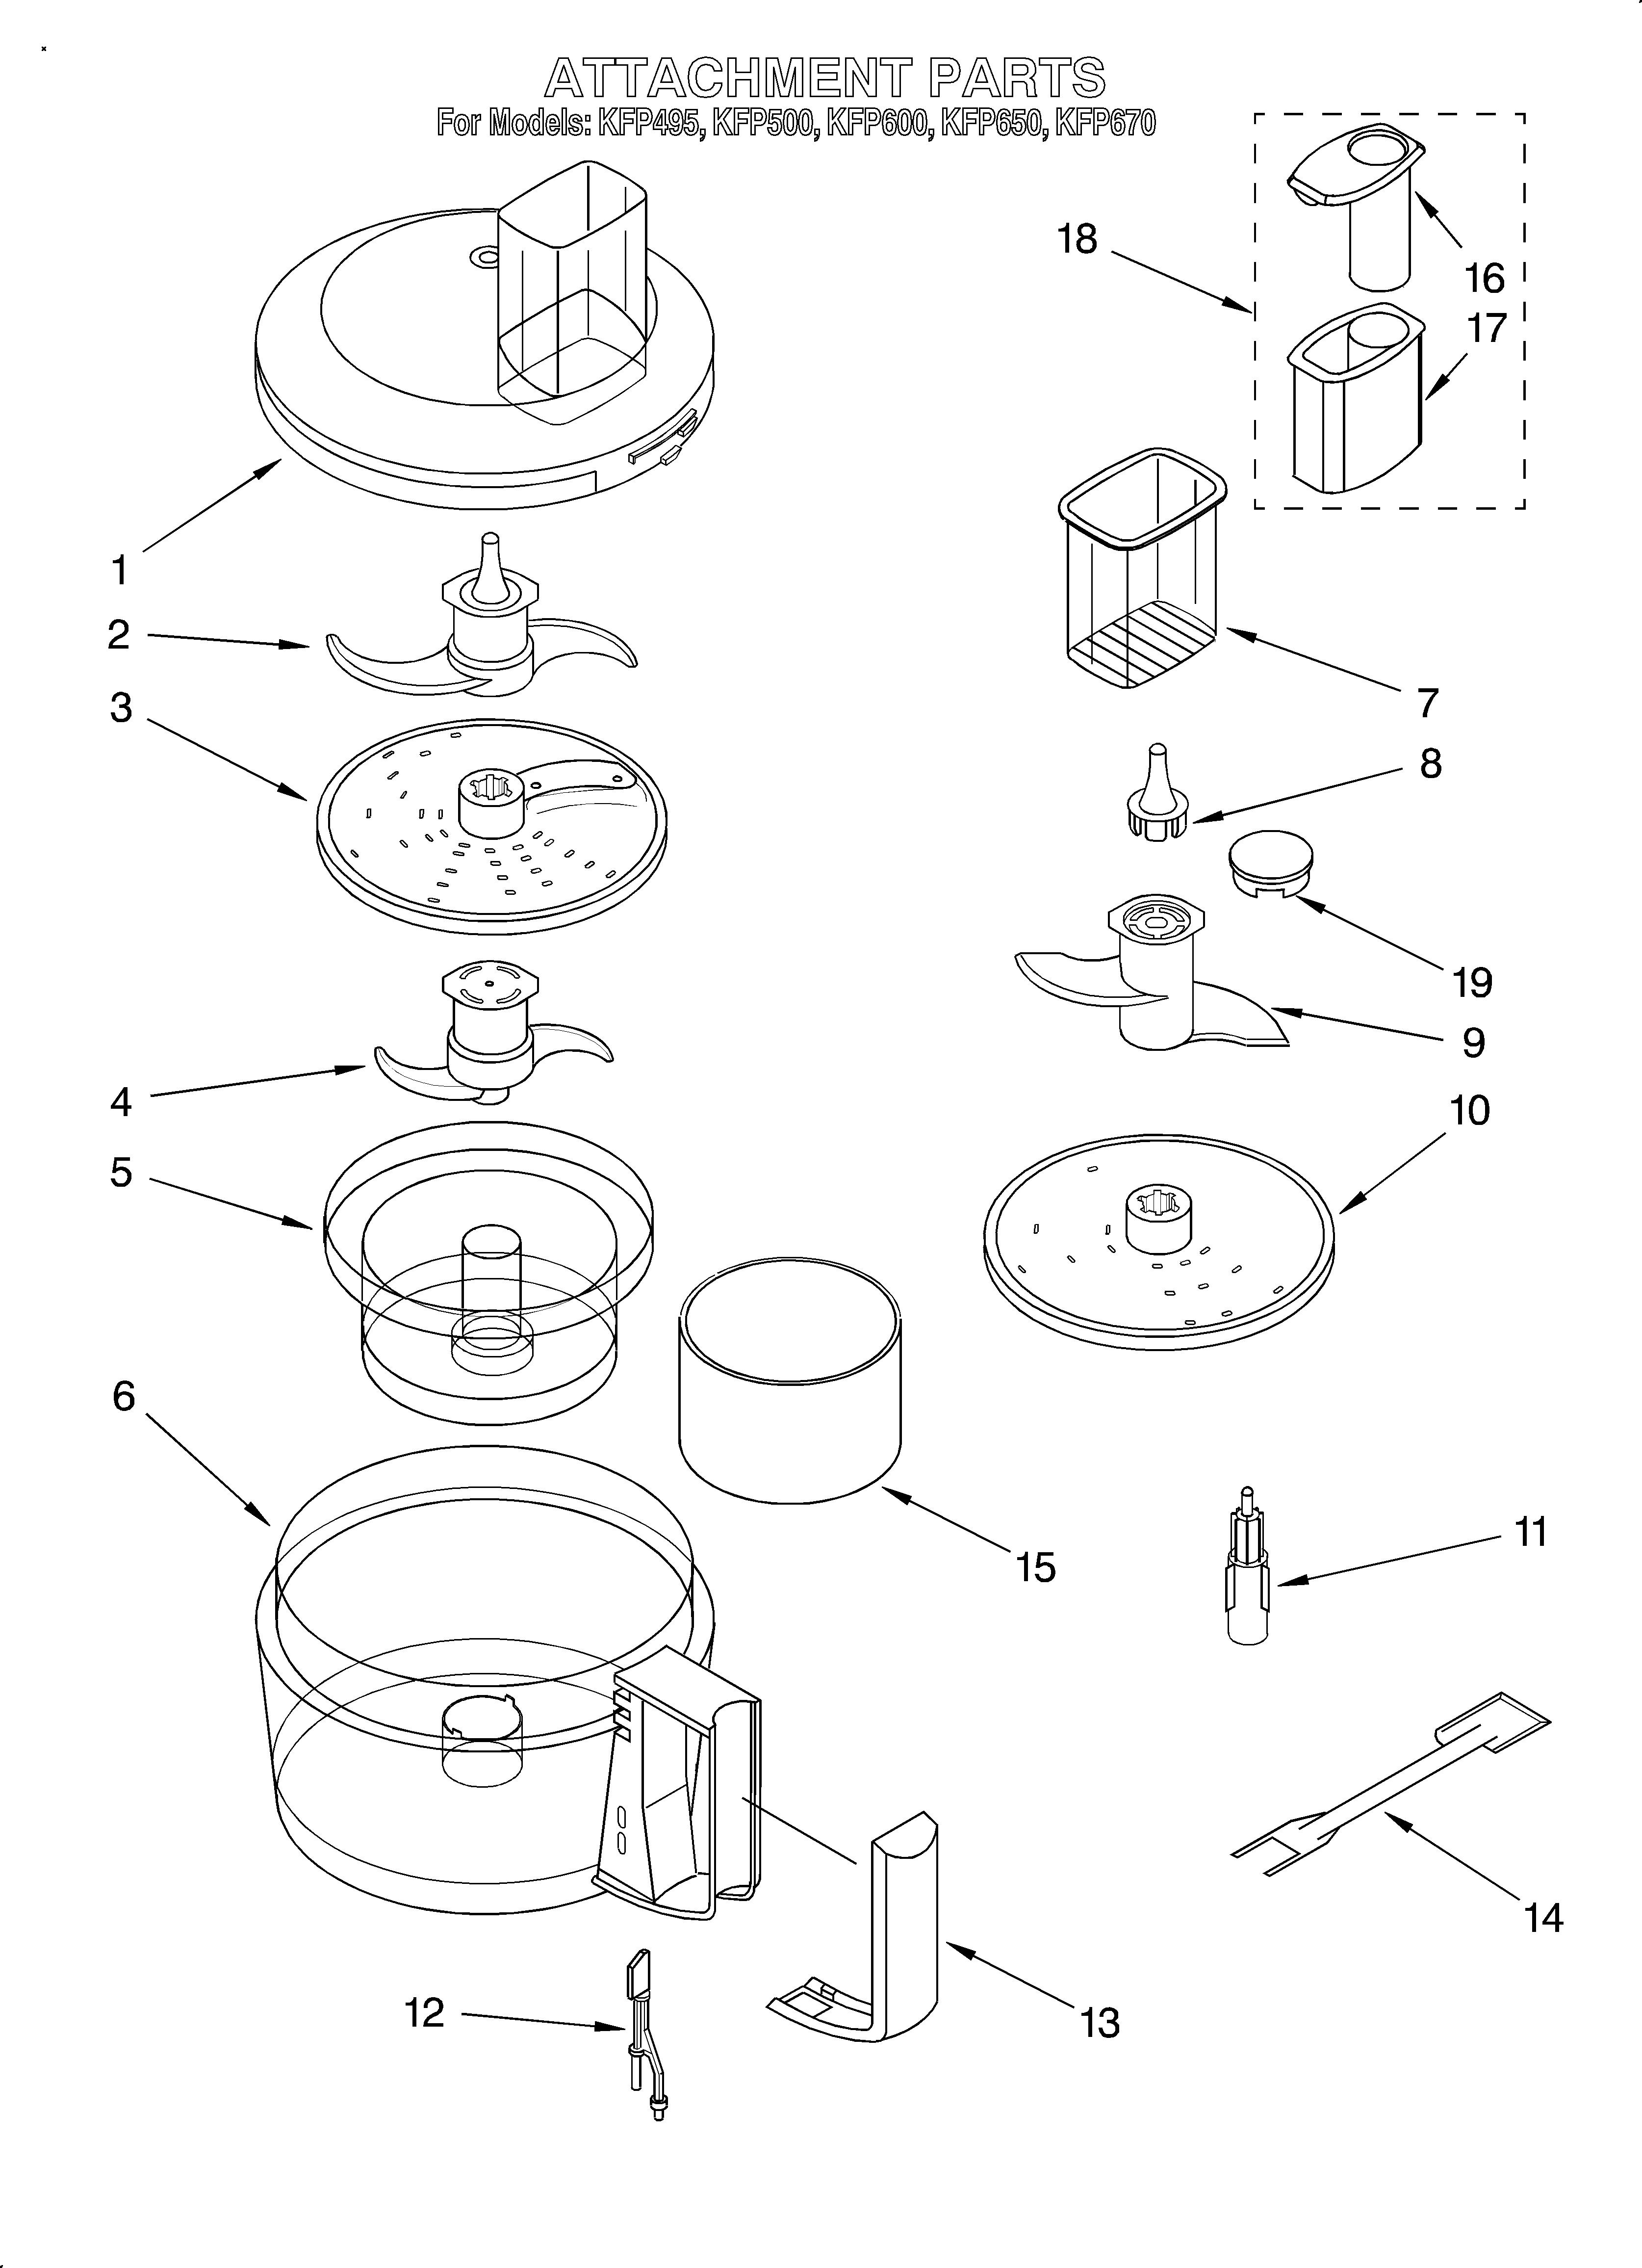 Kitchenaid Food Processor Attachment Parts Model